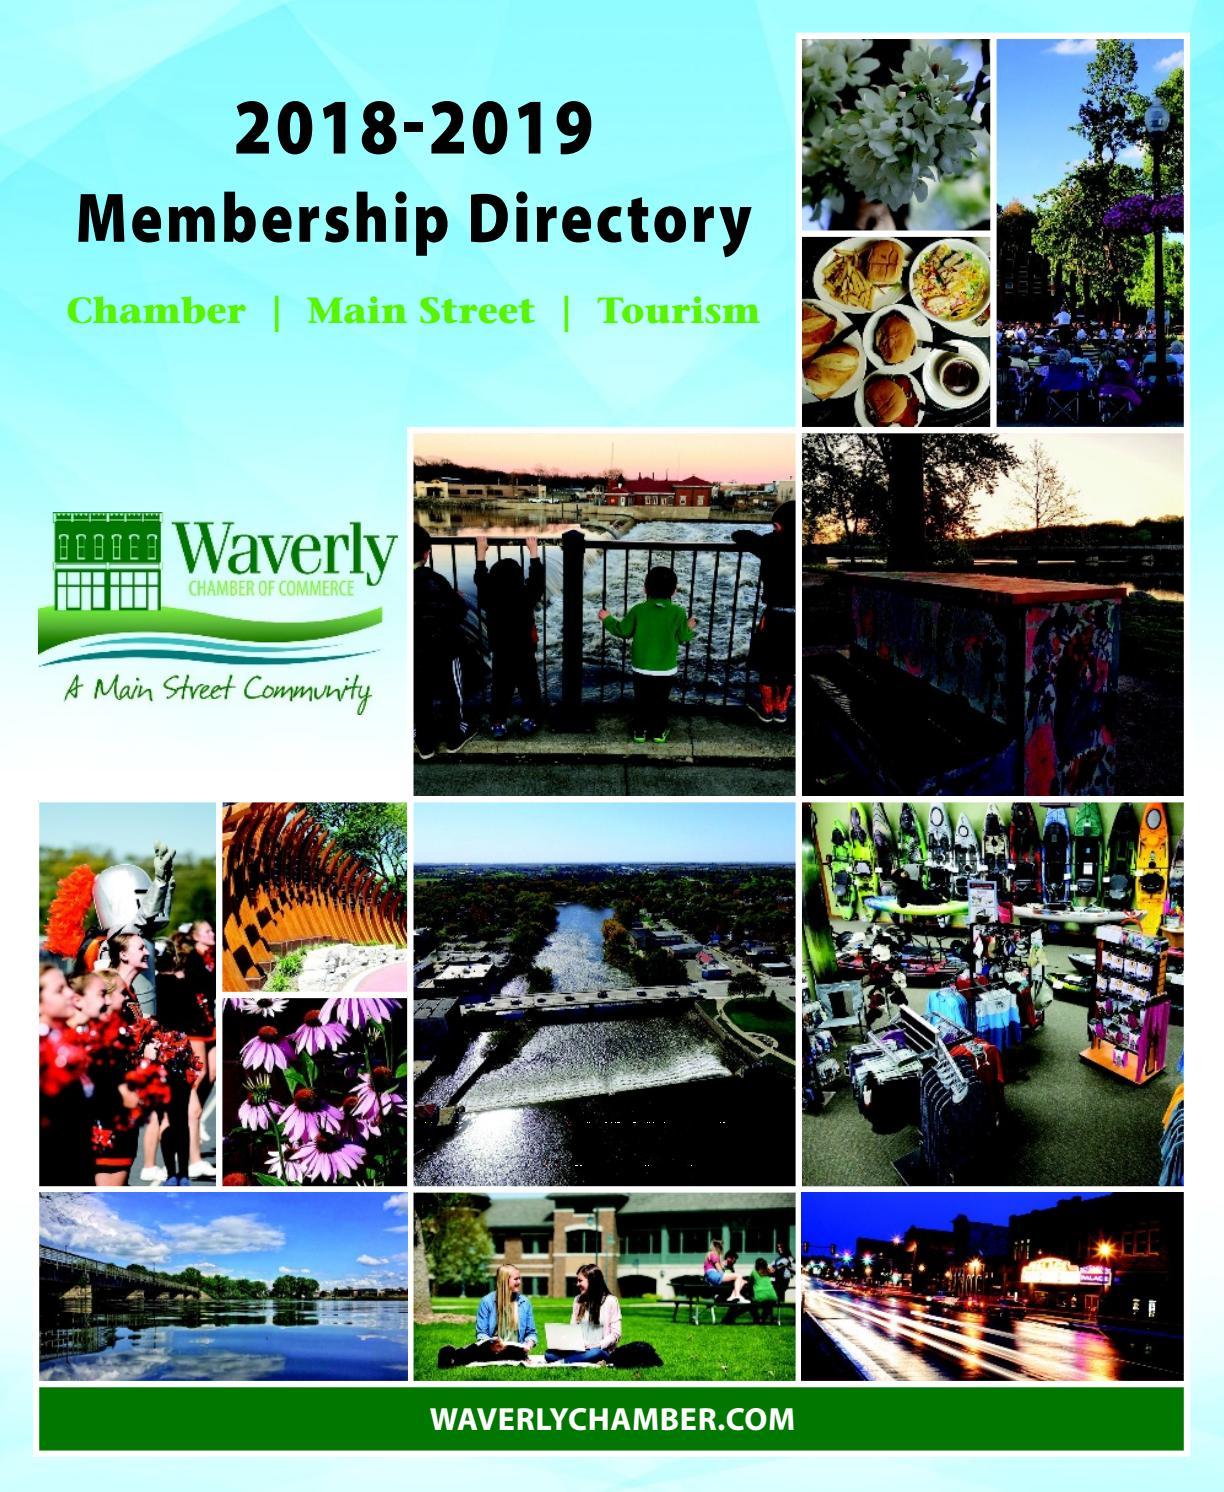 Waverly Chamber Membership Directory 2018-2019 by Waterloo